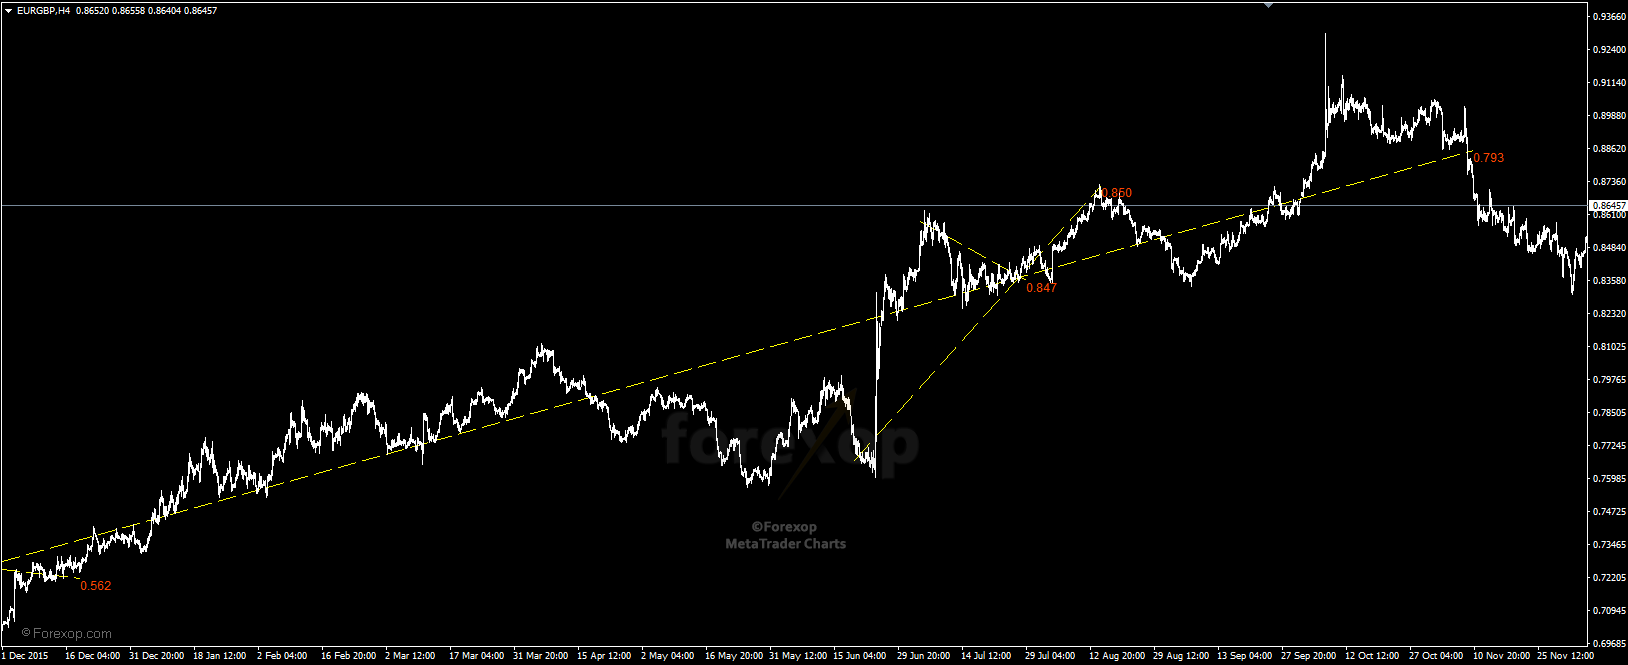 Figure 3: Long trend lines in EURGBP H4